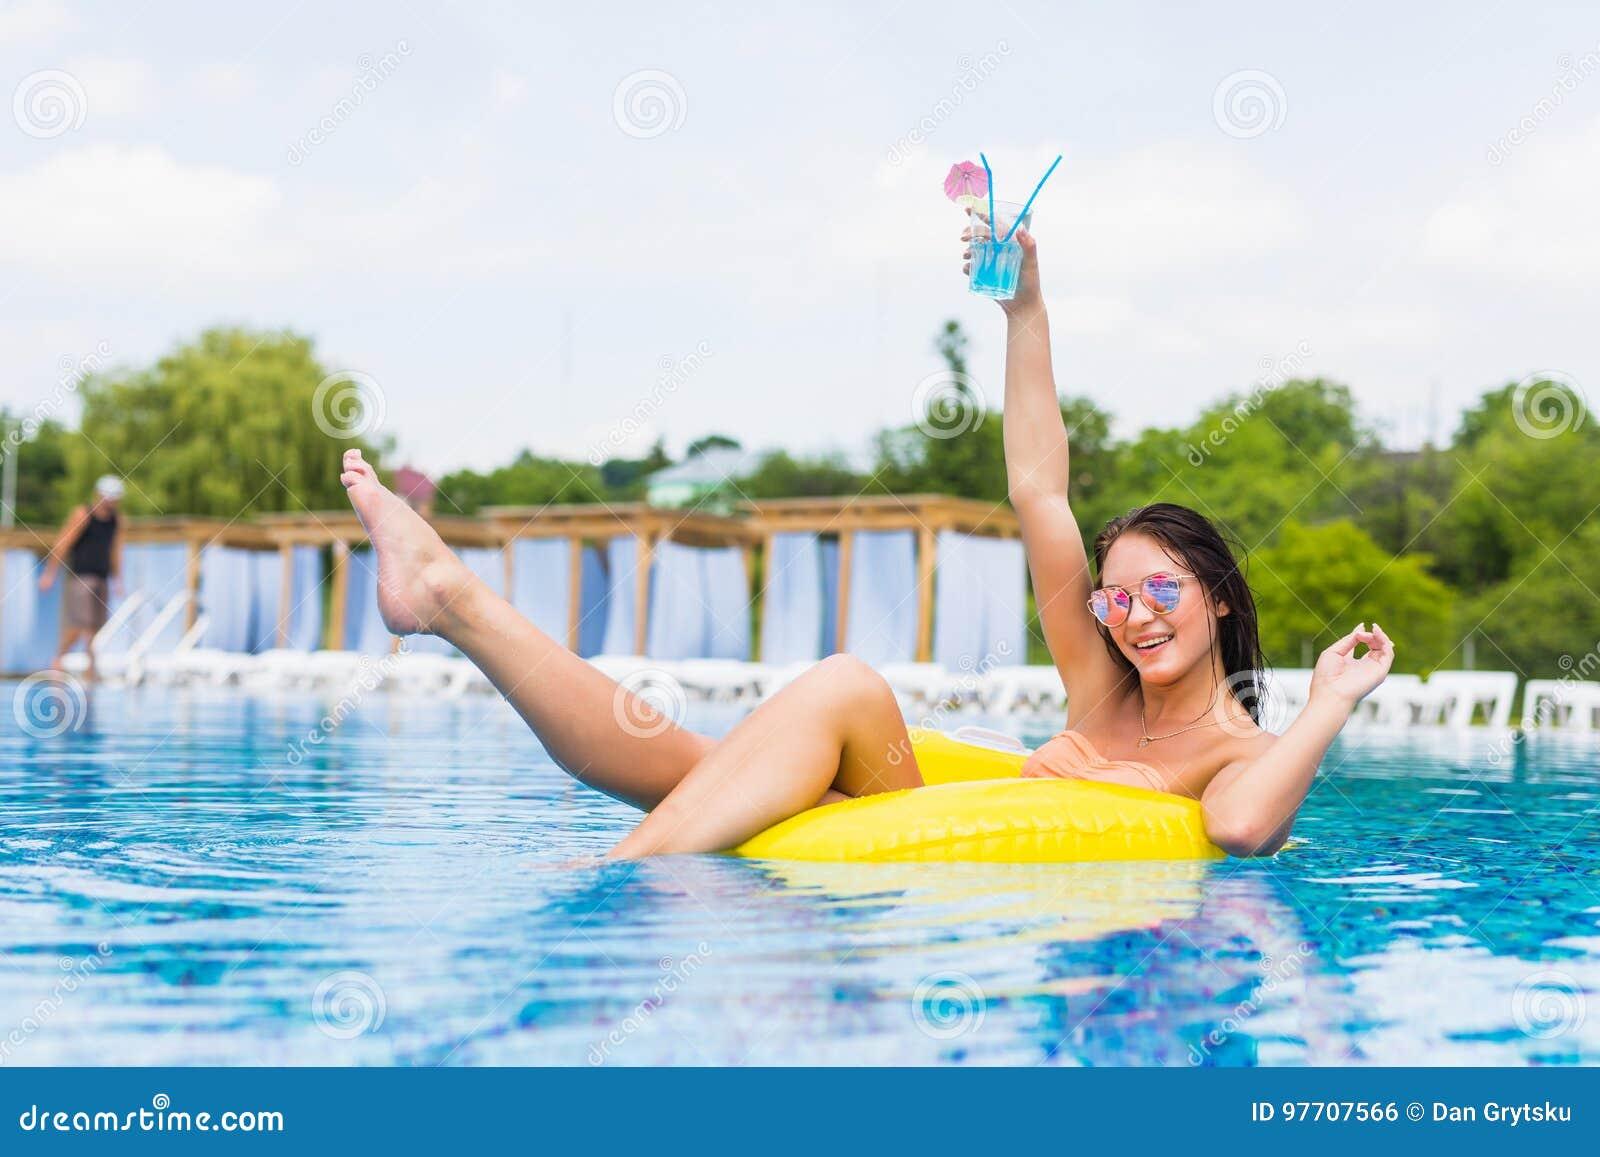 Beach bikini pool summer tanning tiff photos